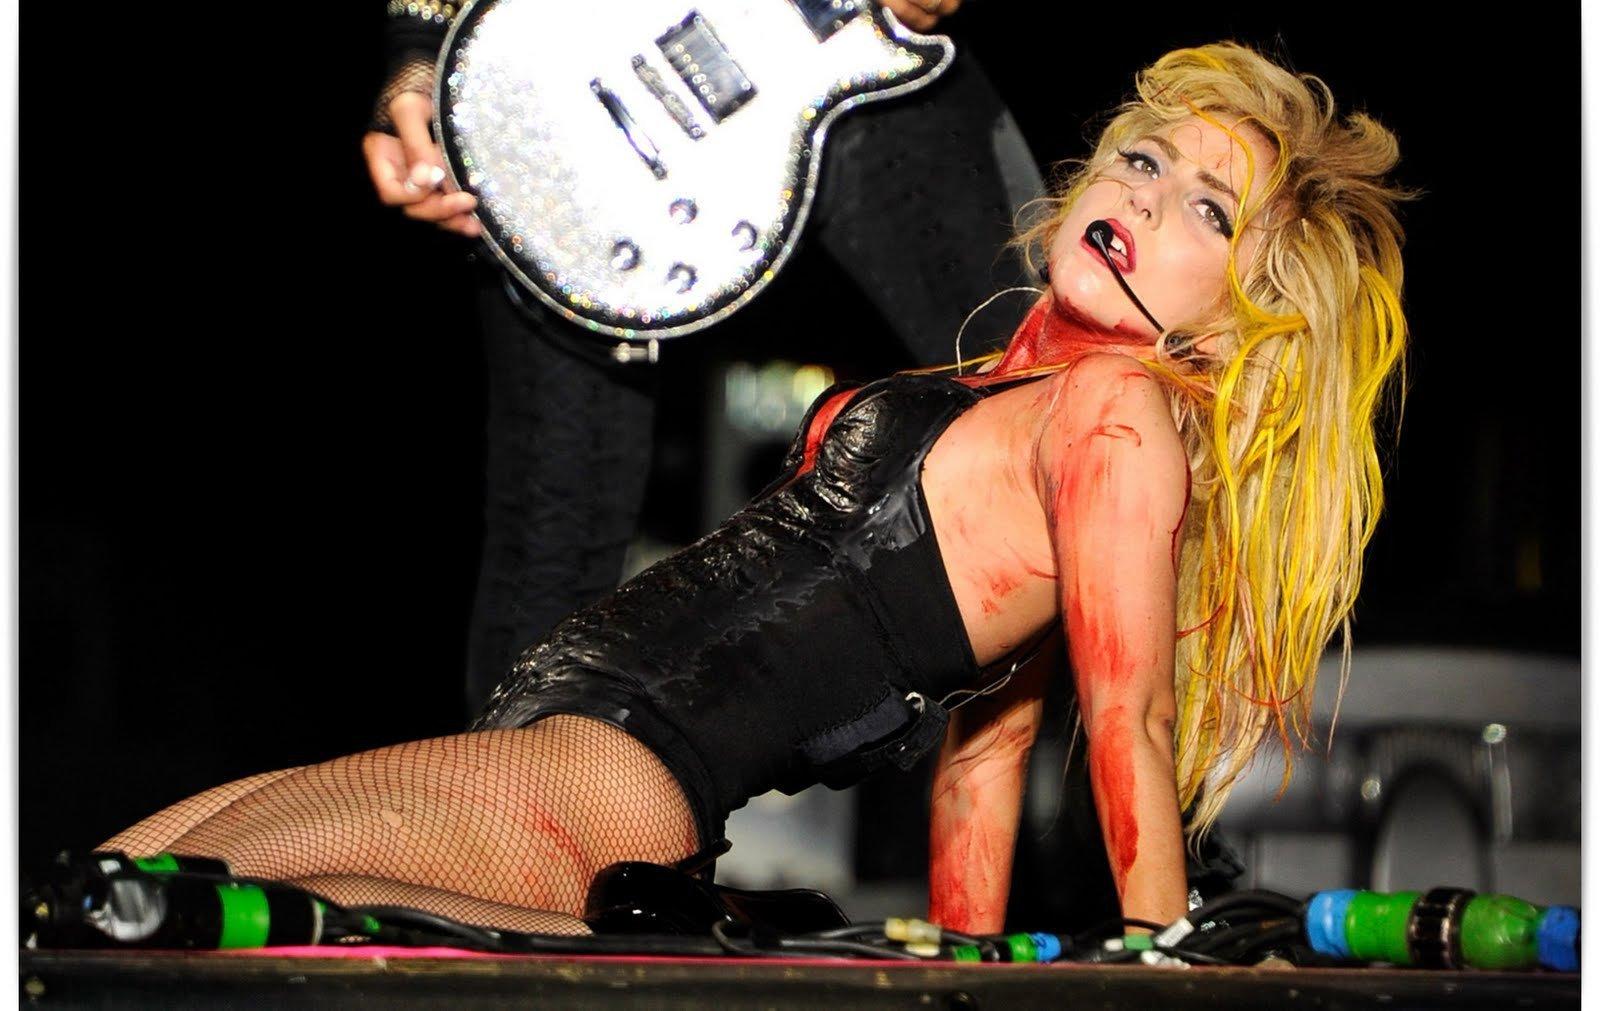 http://3.bp.blogspot.com/-I4lS7eFgjEQ/TnZ58hNTkwI/AAAAAAAADFs/mgbe0SjKW3o/s1600/lady-gaga-monster-ball-lady-gaga-19411066-1600-1011.jpg